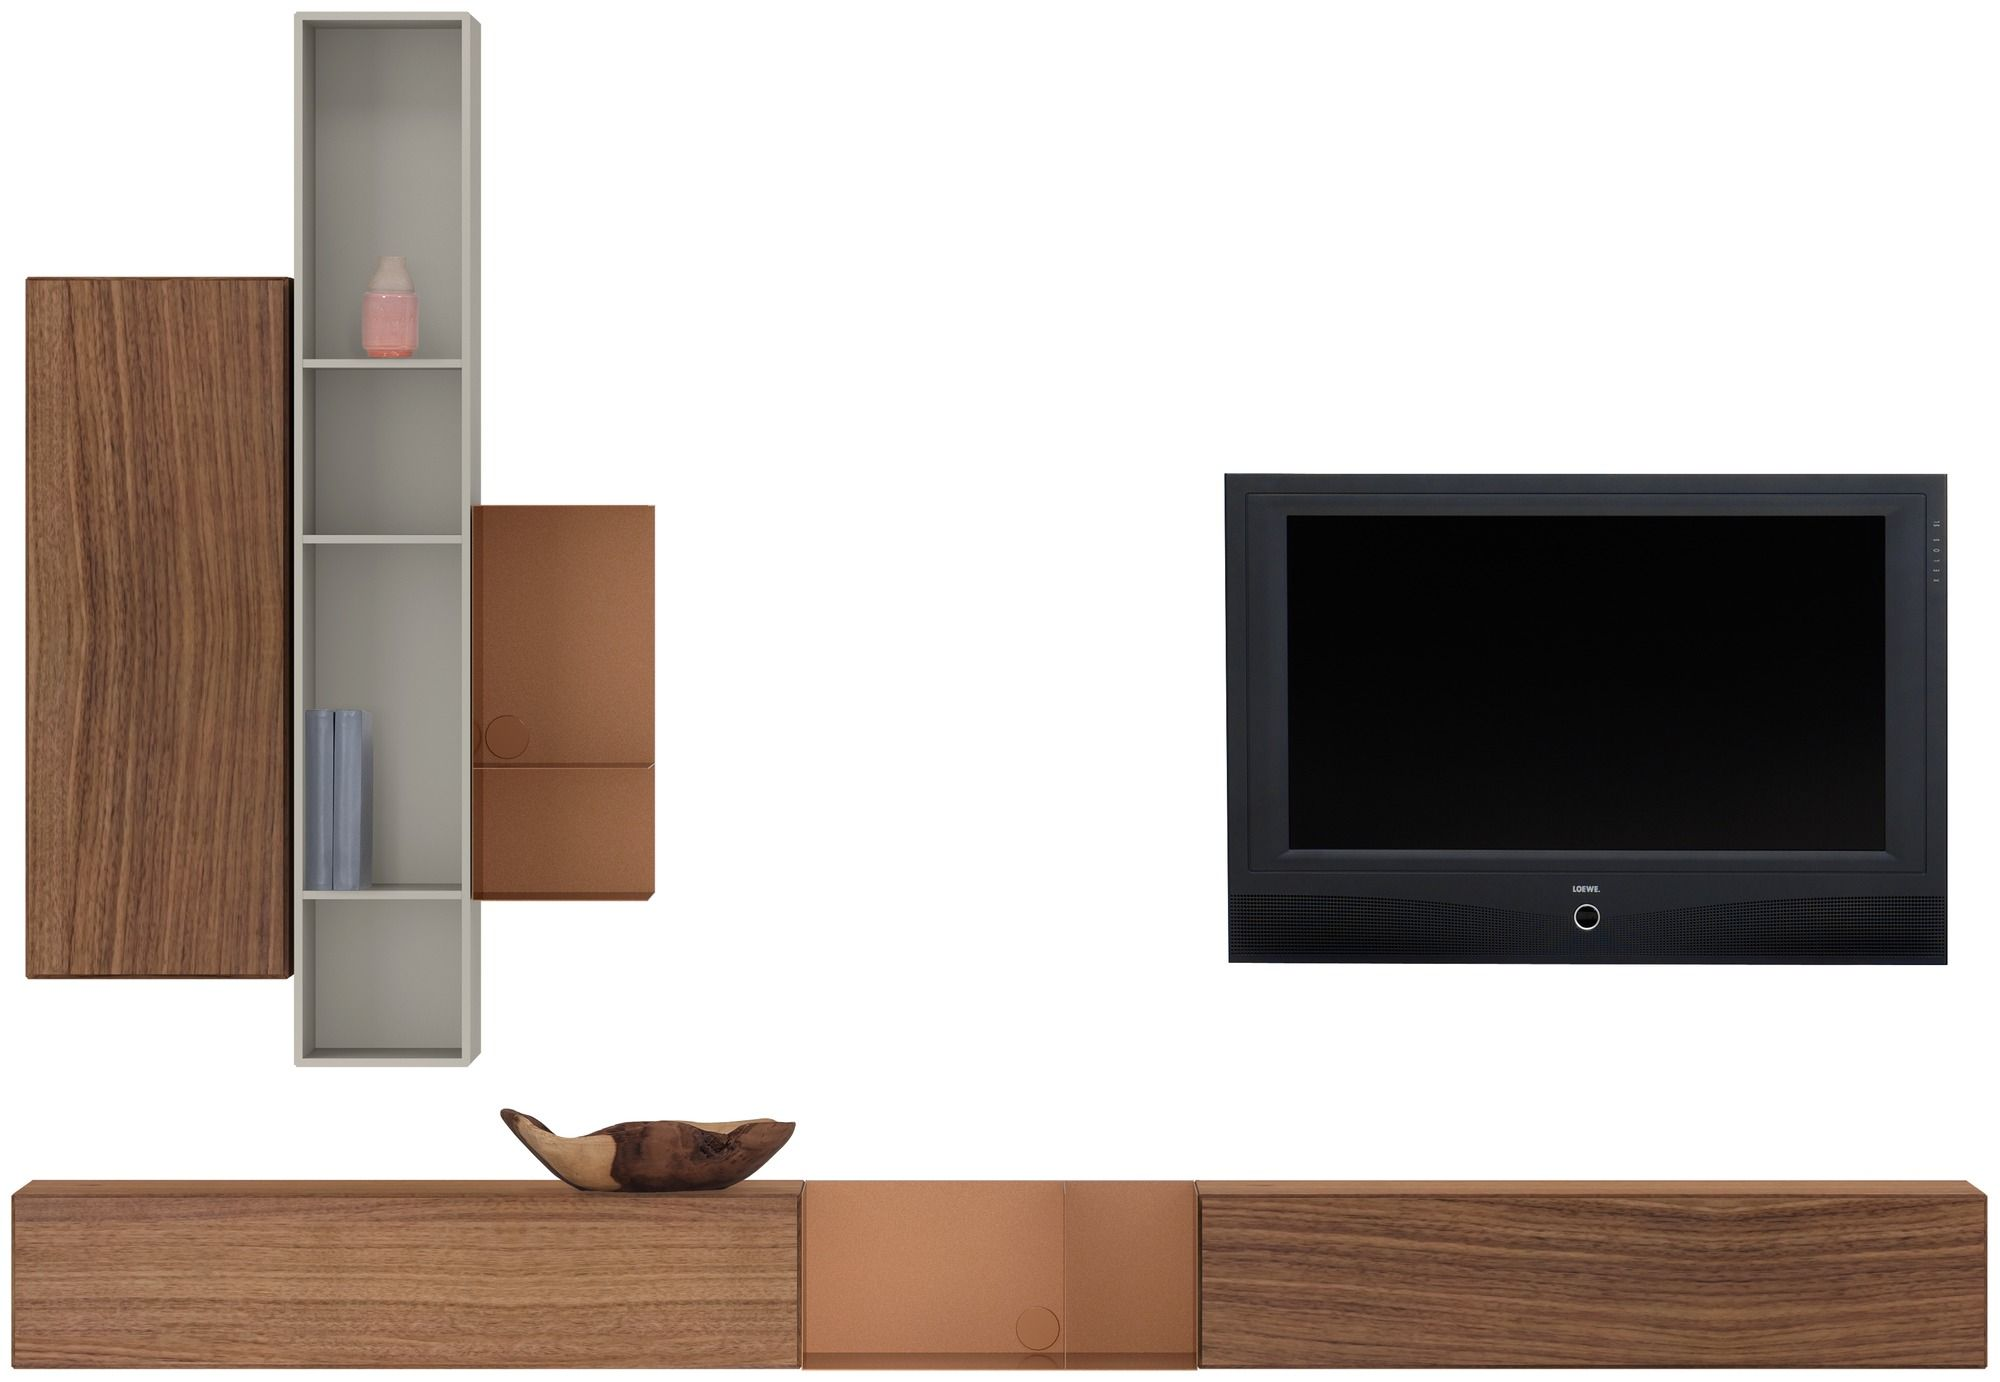 boconcept lugano tv wall unit pinterest boconcept. Black Bedroom Furniture Sets. Home Design Ideas